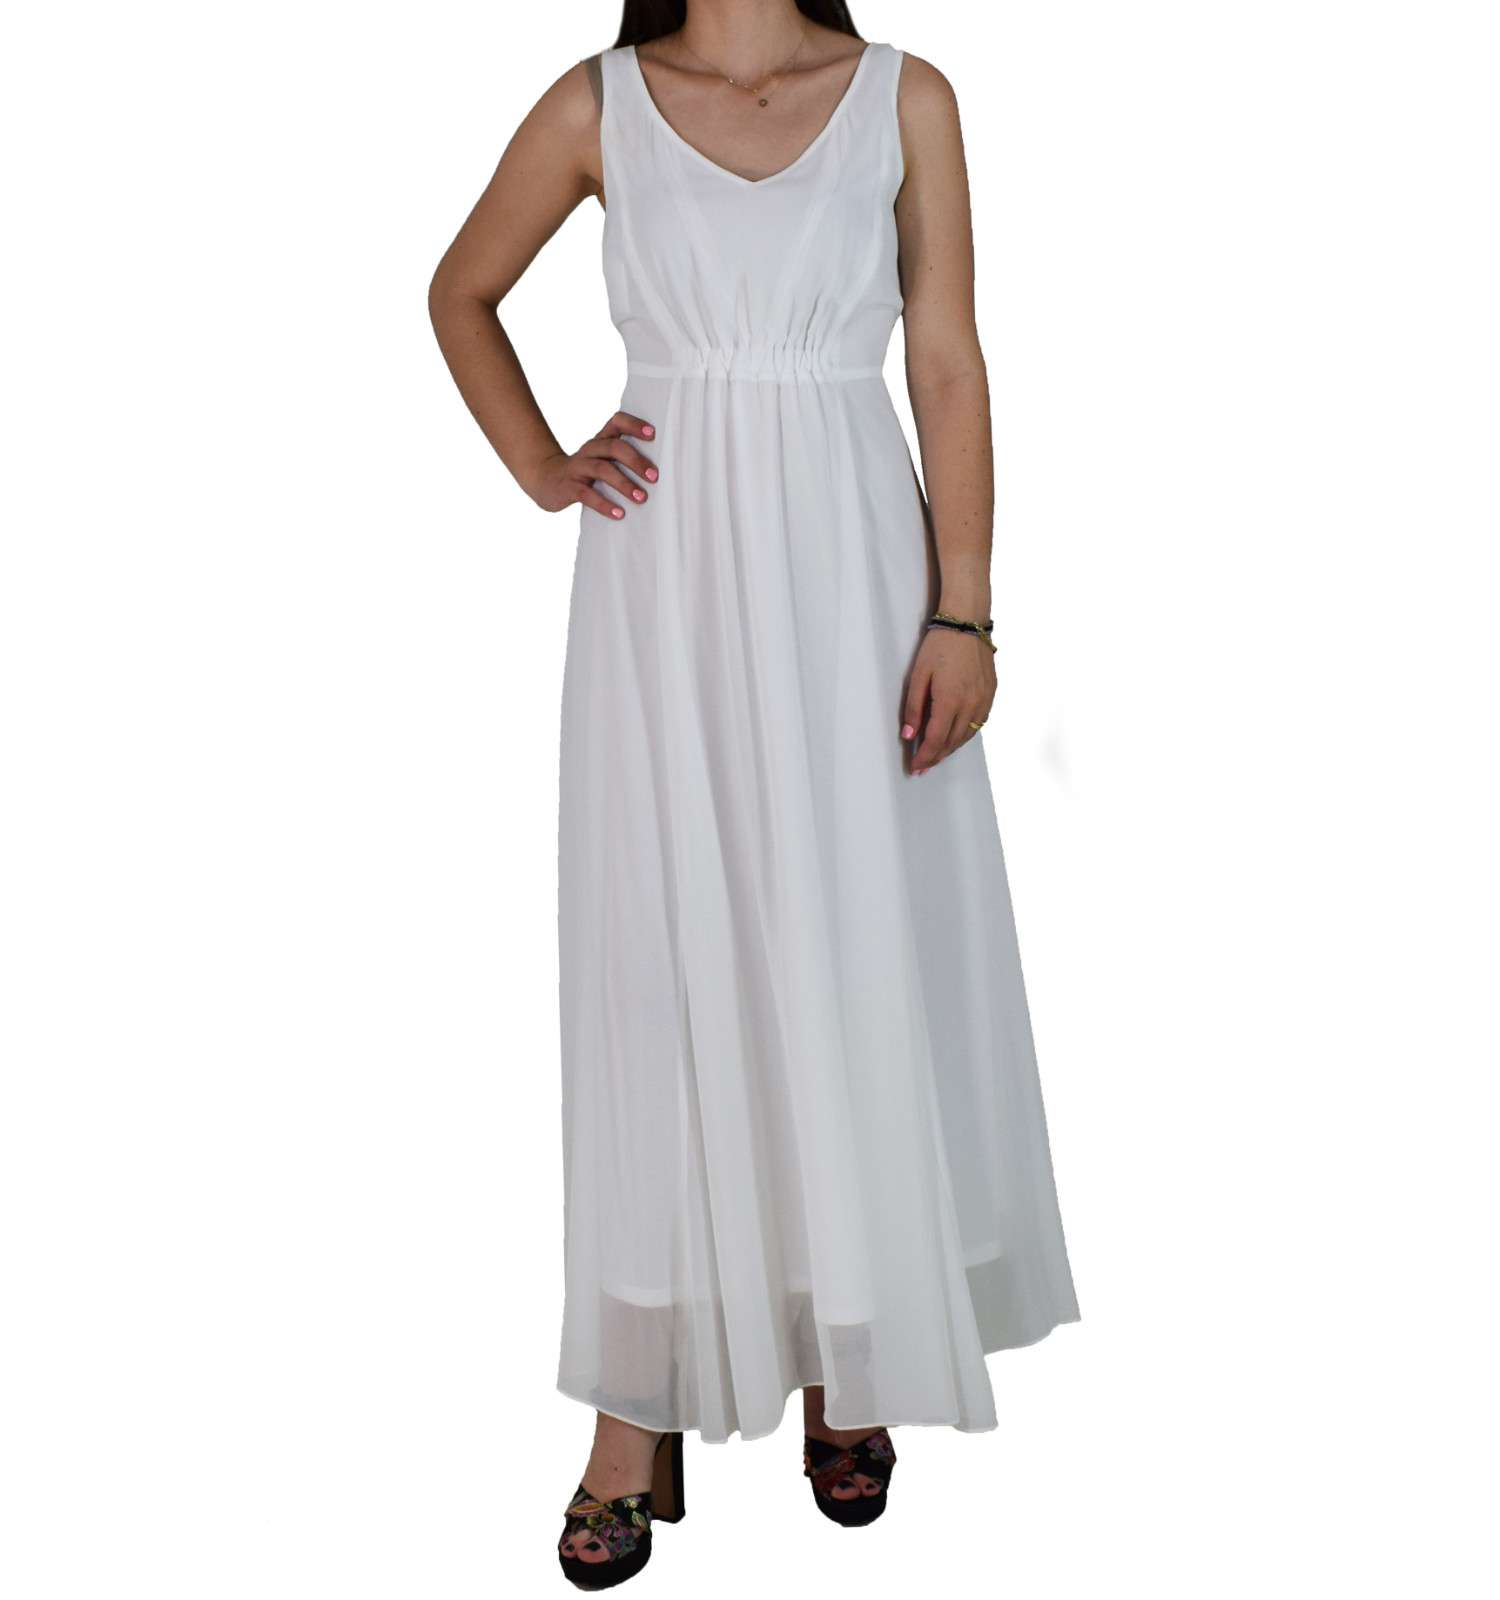 29538325f6c5 Maxi Φόρεμα Passager 75358 Λευκό passager 75358 leyko - Glami.gr